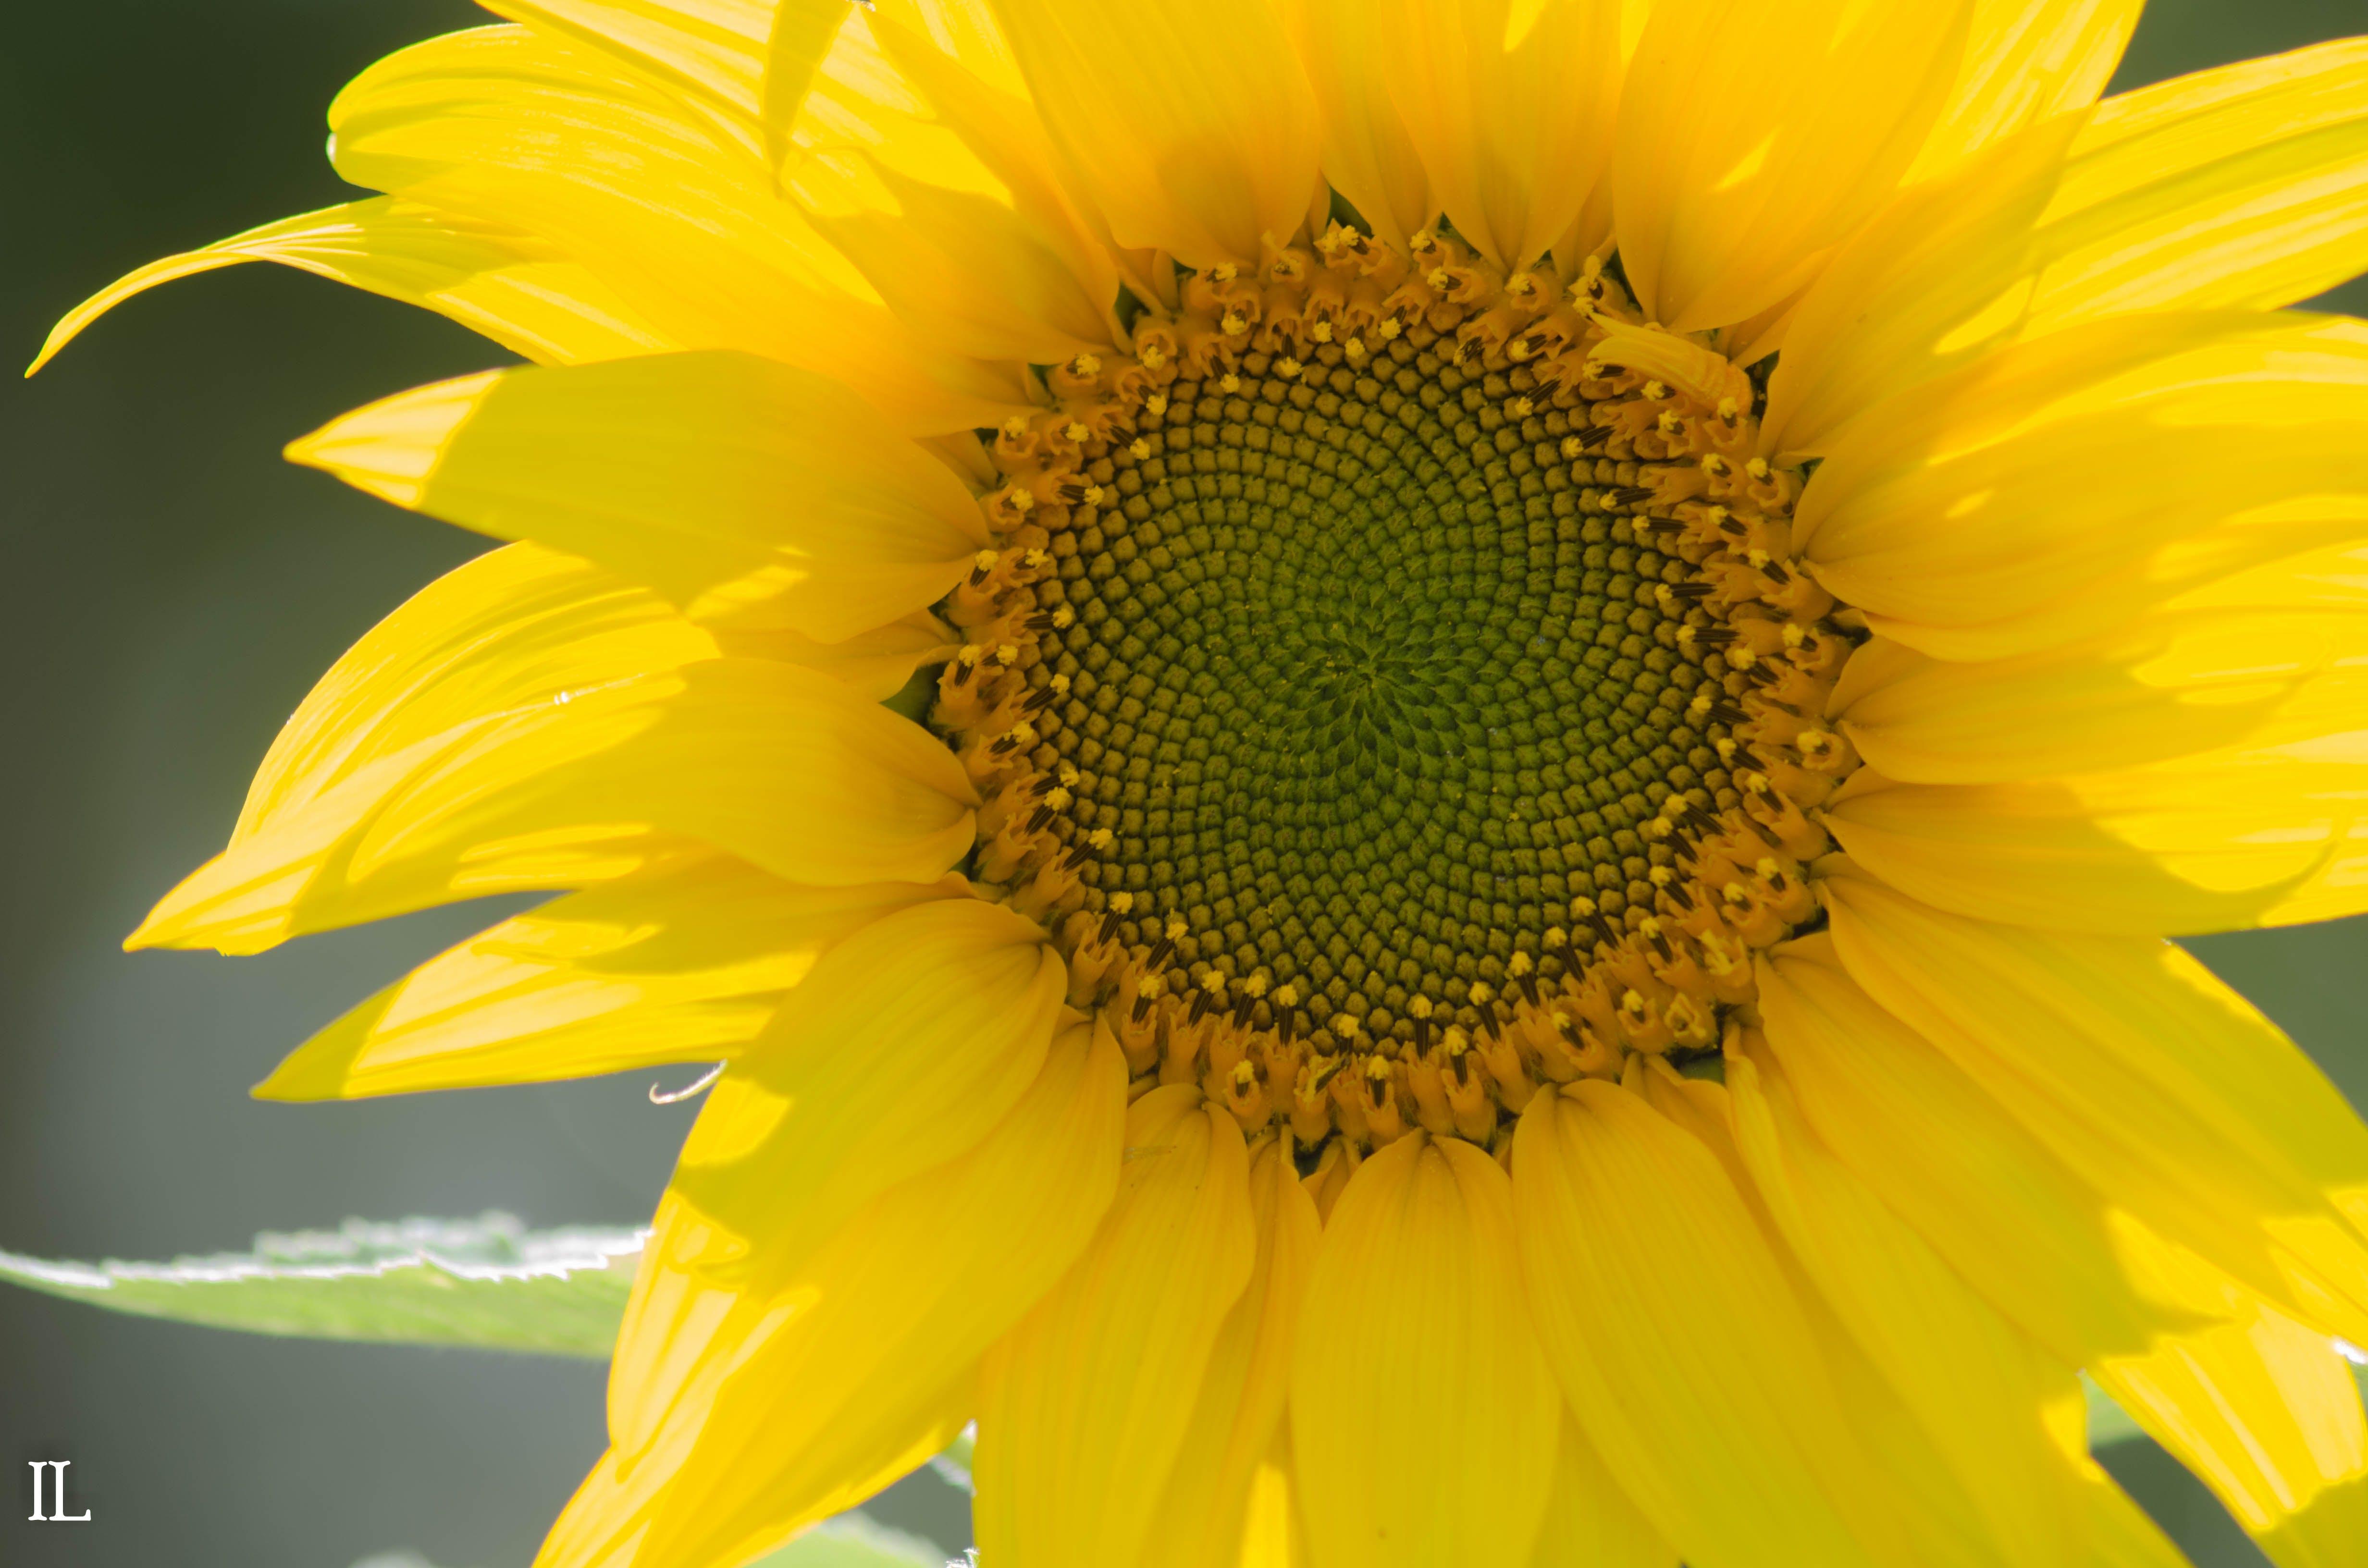 Free stock photo of flower, sunflower, yellow flower